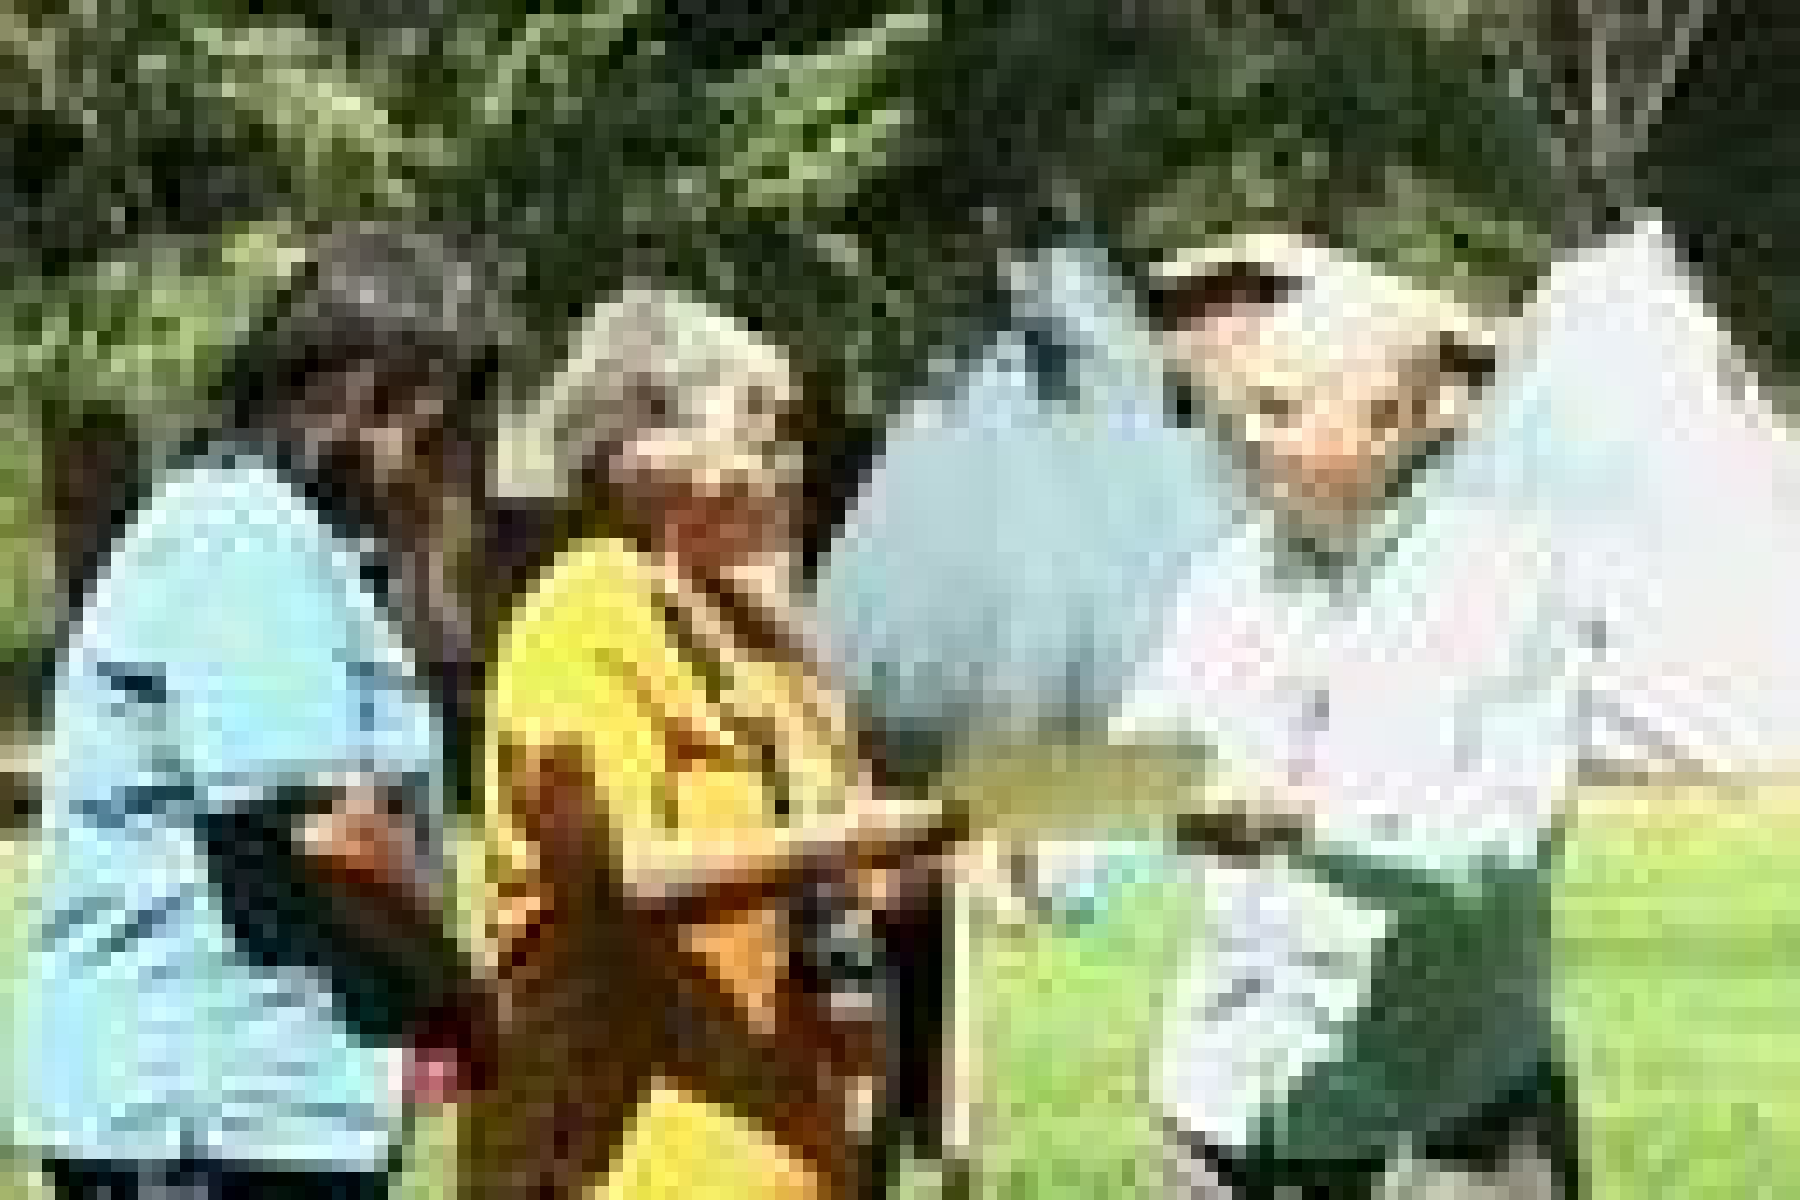 Wallowa Lake ceremony in Oregon honors return of land.